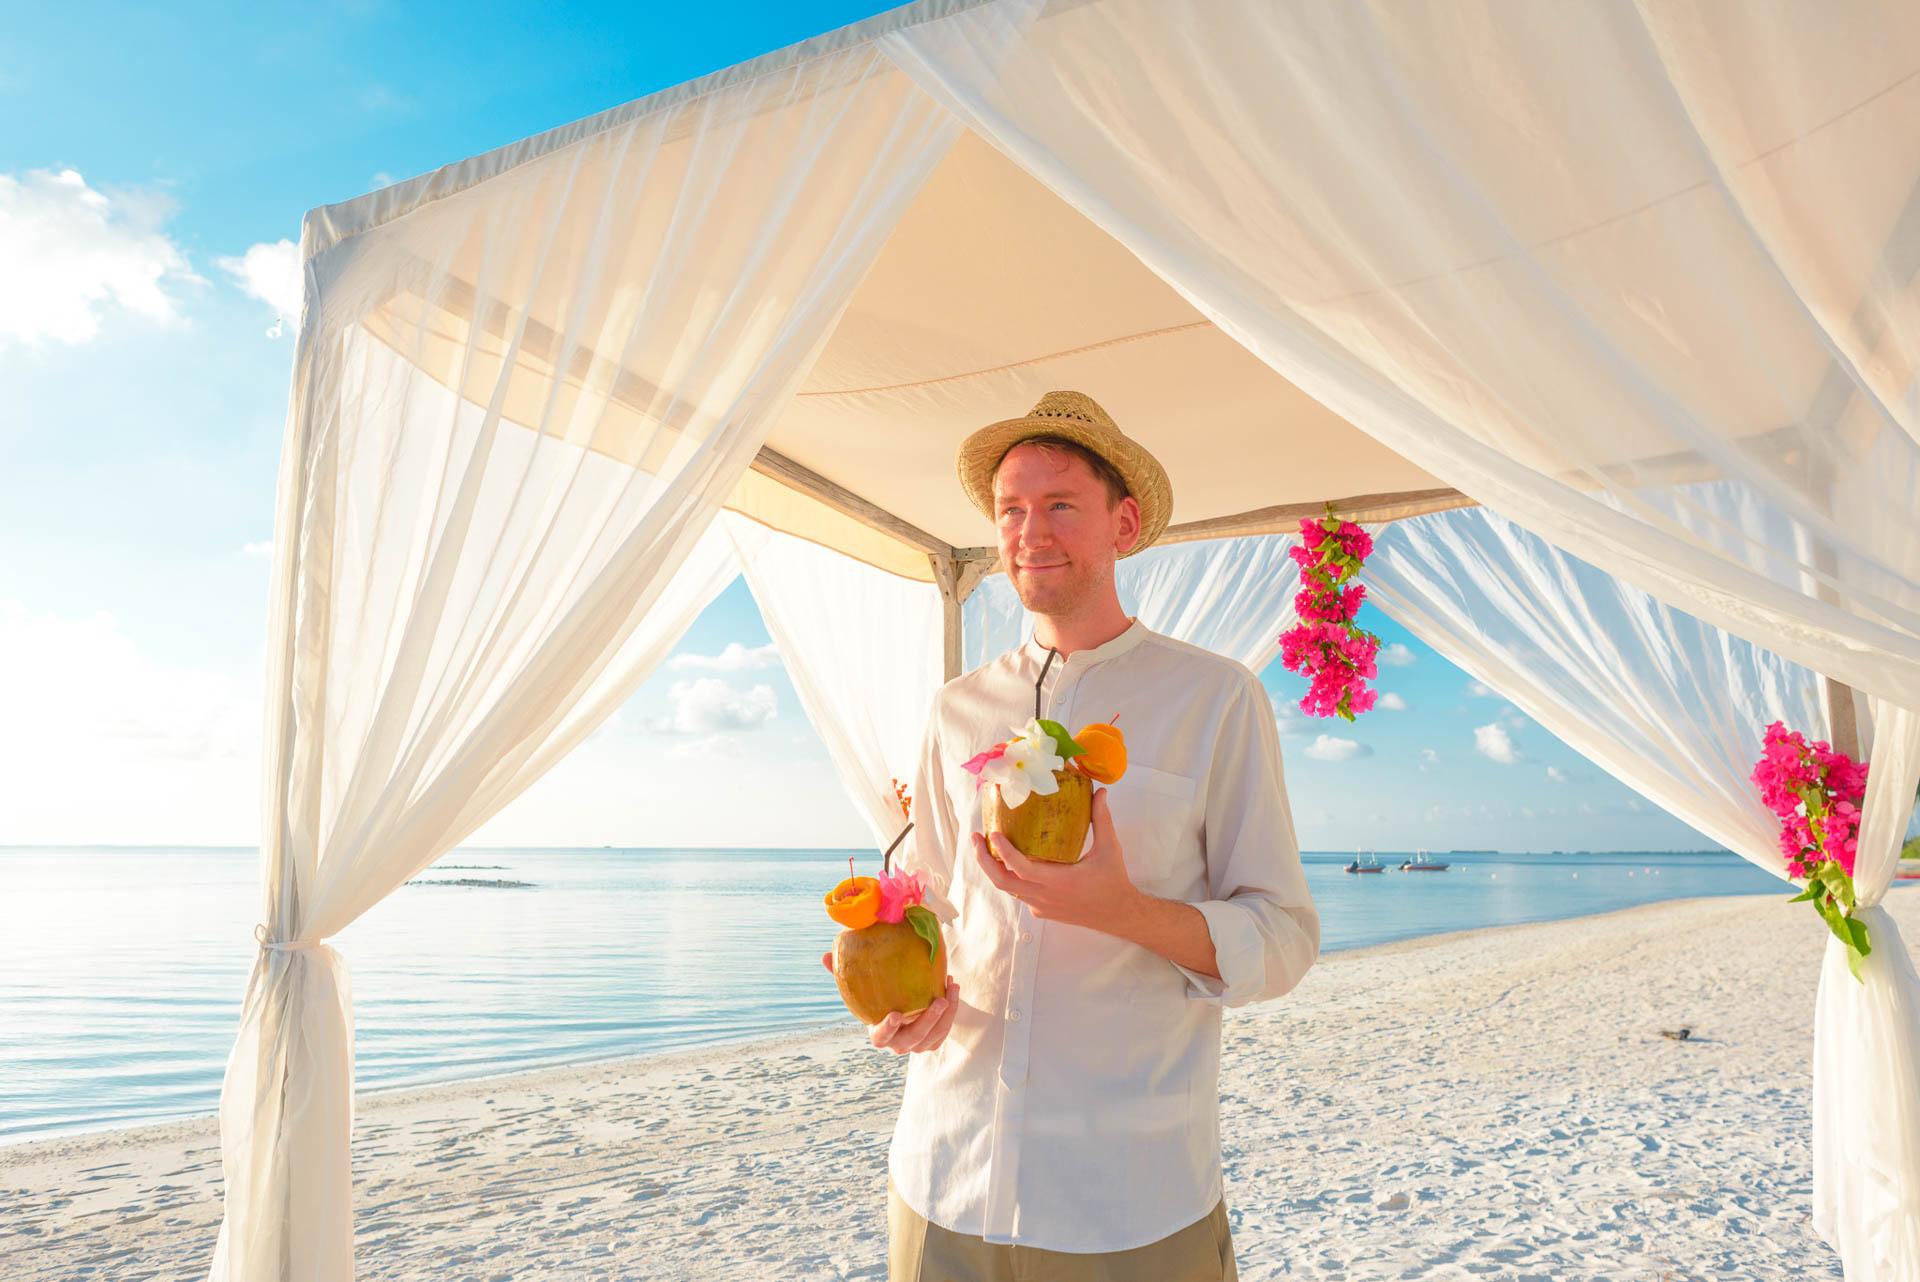 Heike Michaels Beach Wedding in Maldives 15